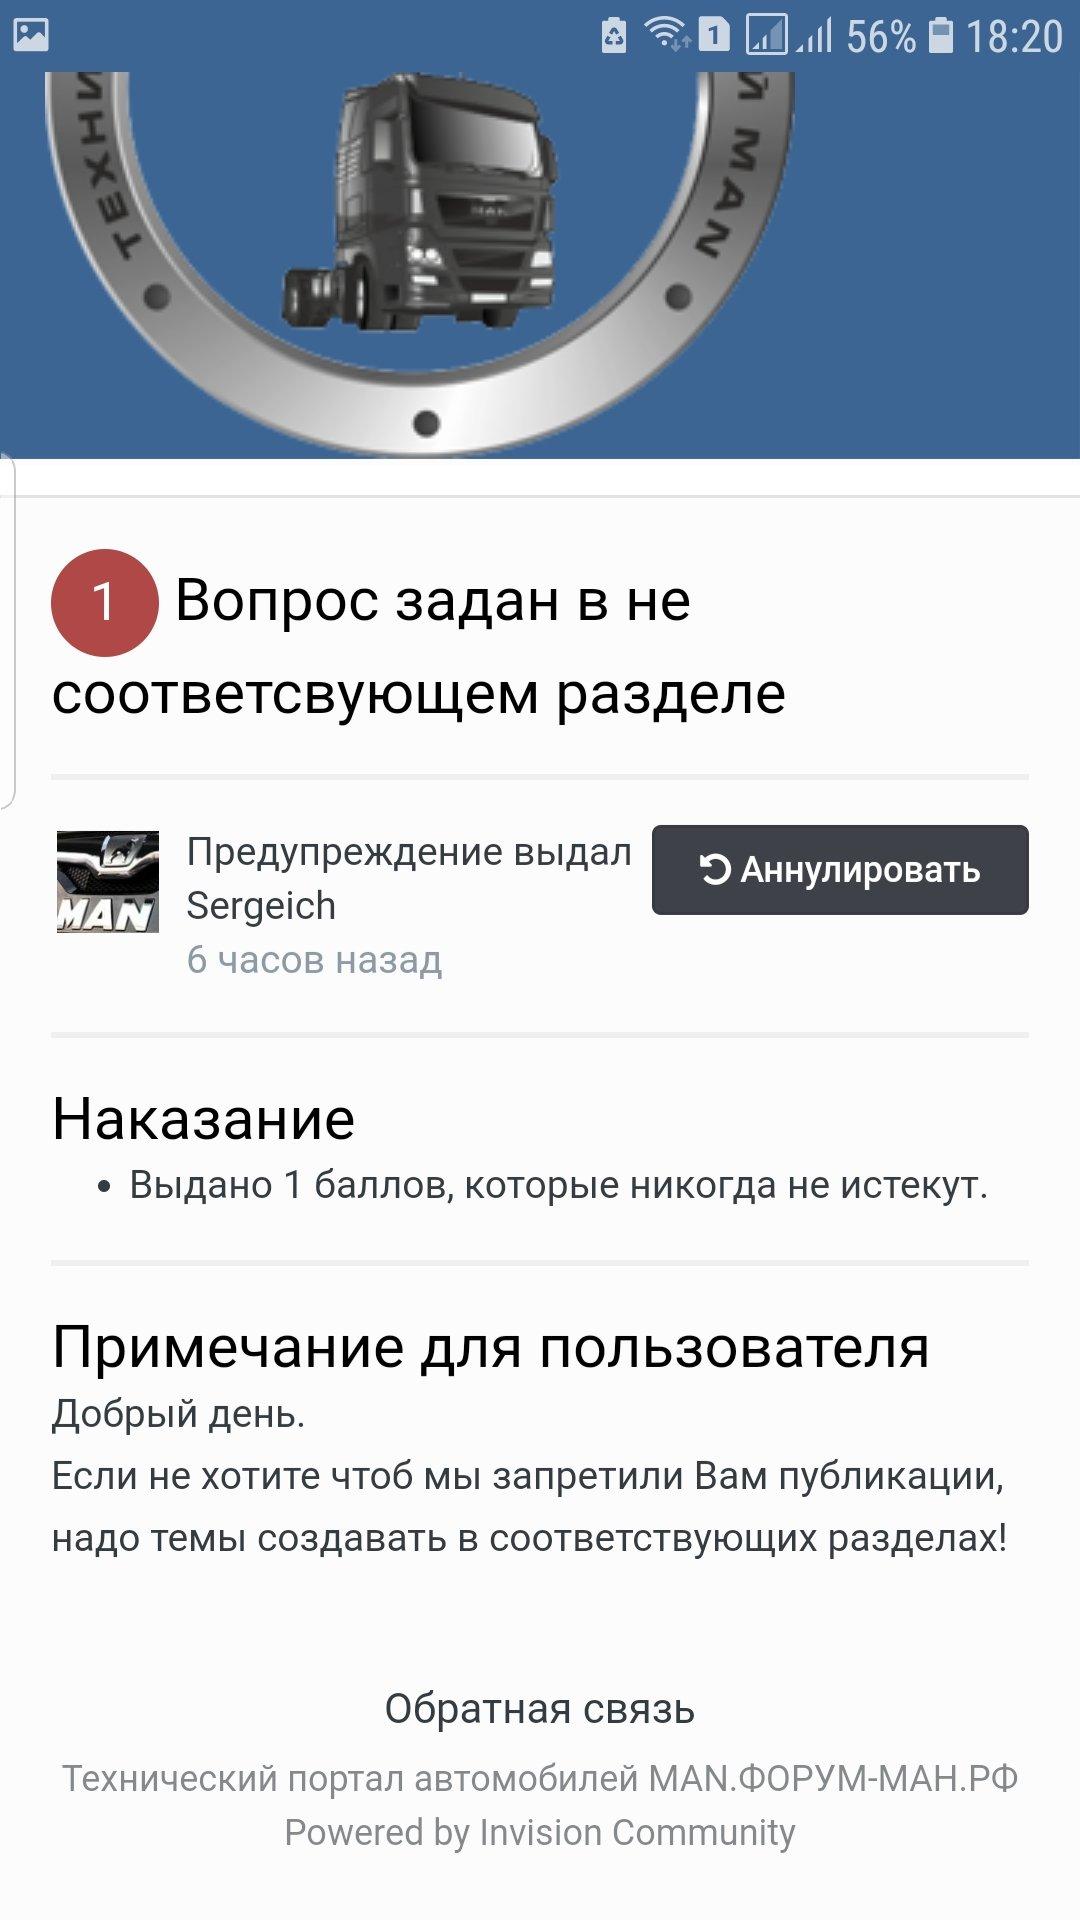 Screenshot_20190407-182020_Chrome.jpg.b1d260f05931bfb8933dd9e4b4c9f966.jpg